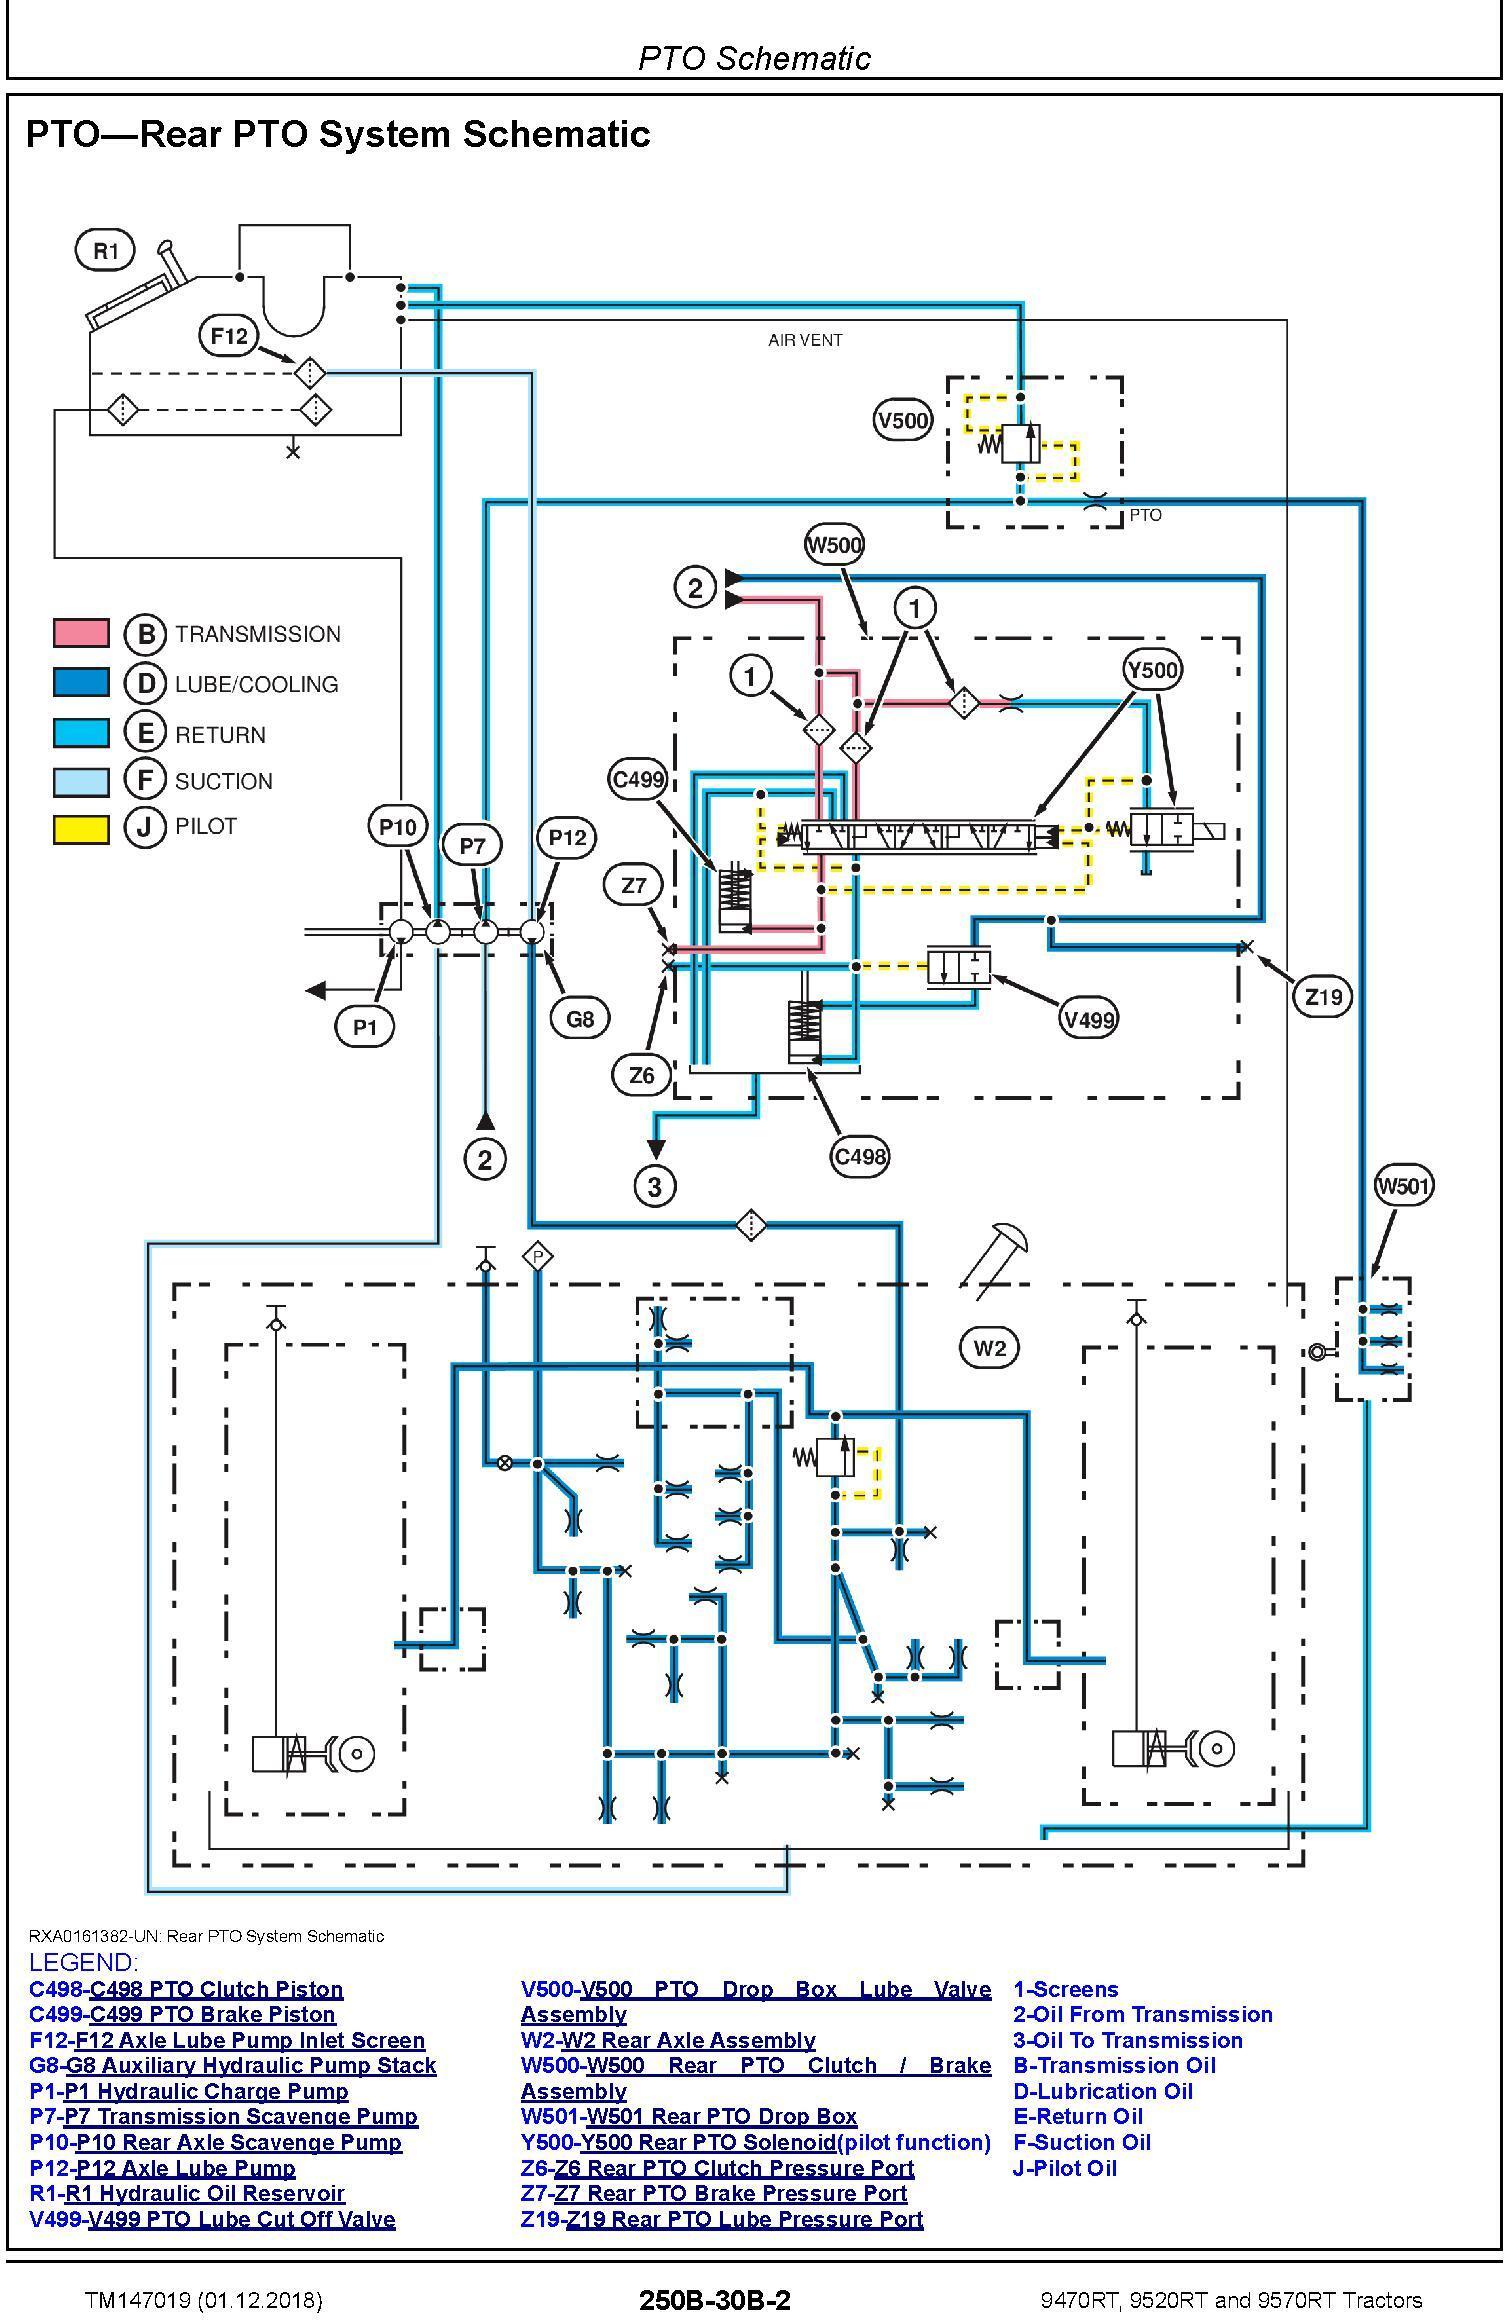 John Deere 9470RT, 9520RT and 9570RT Tractors (SN. 917000-) Diagnostic Technical Manual (TM147019) - 3